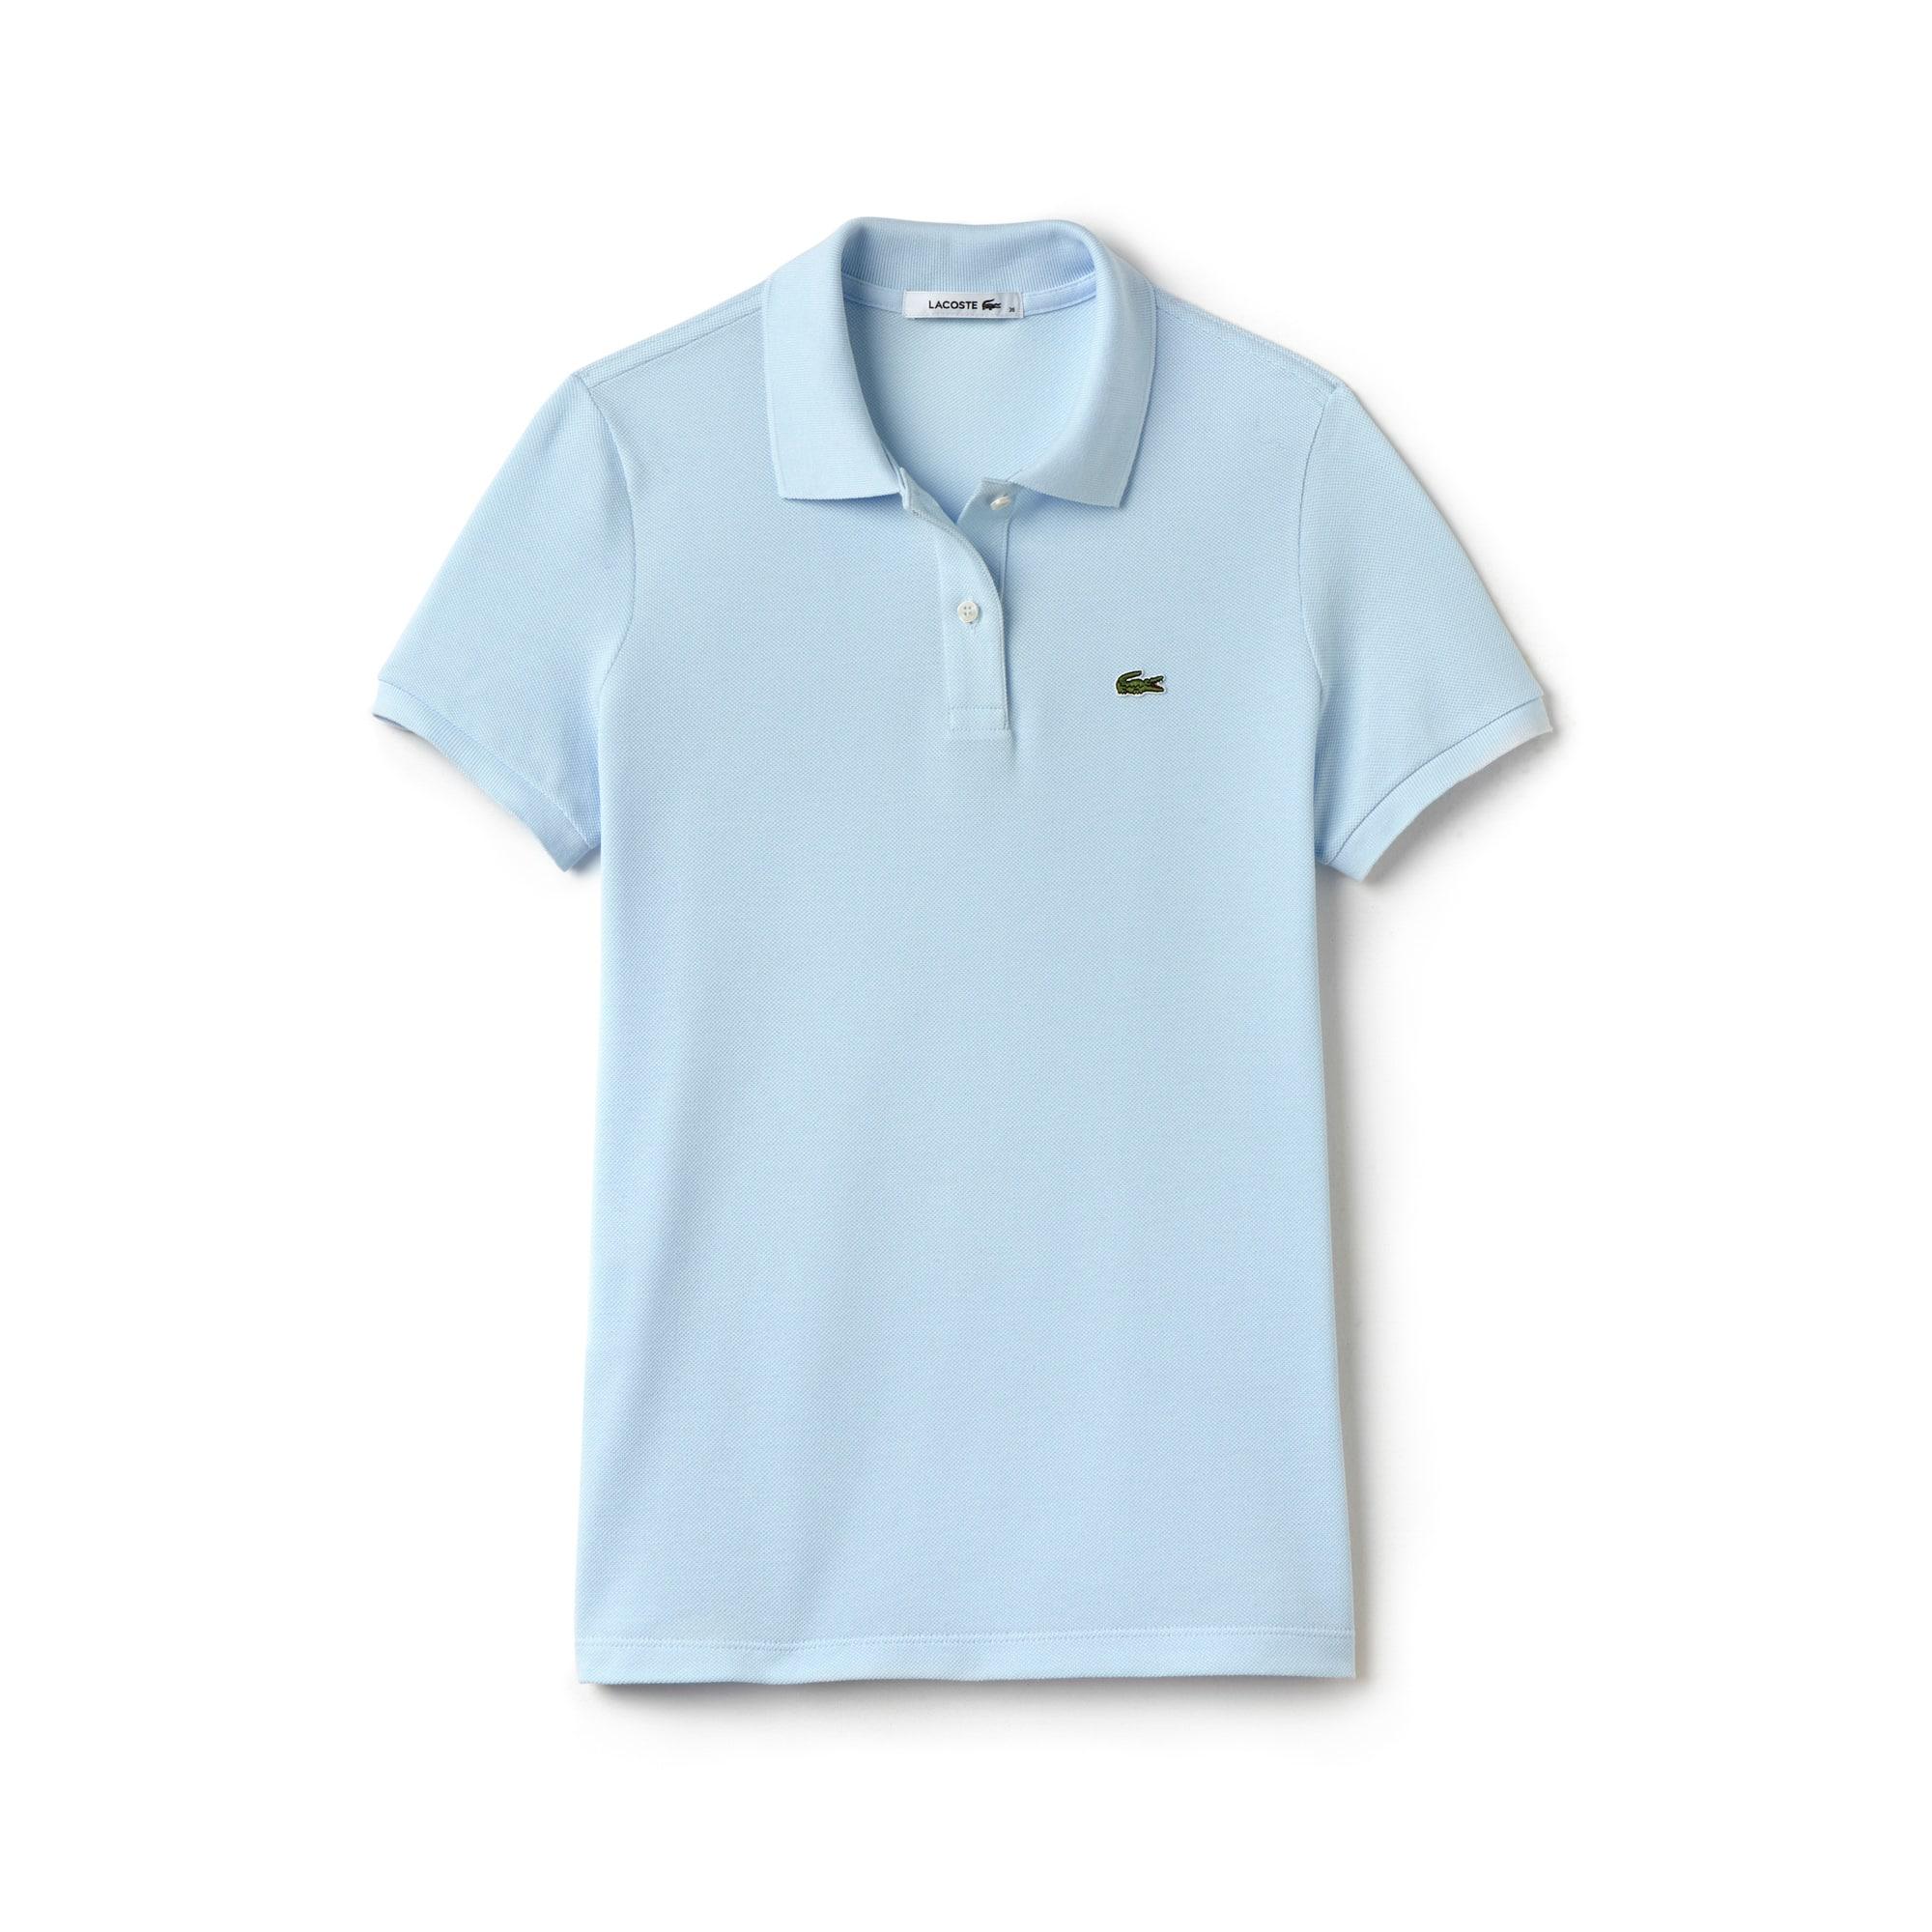 Women's Classic Fit Piqué Polo Shirt